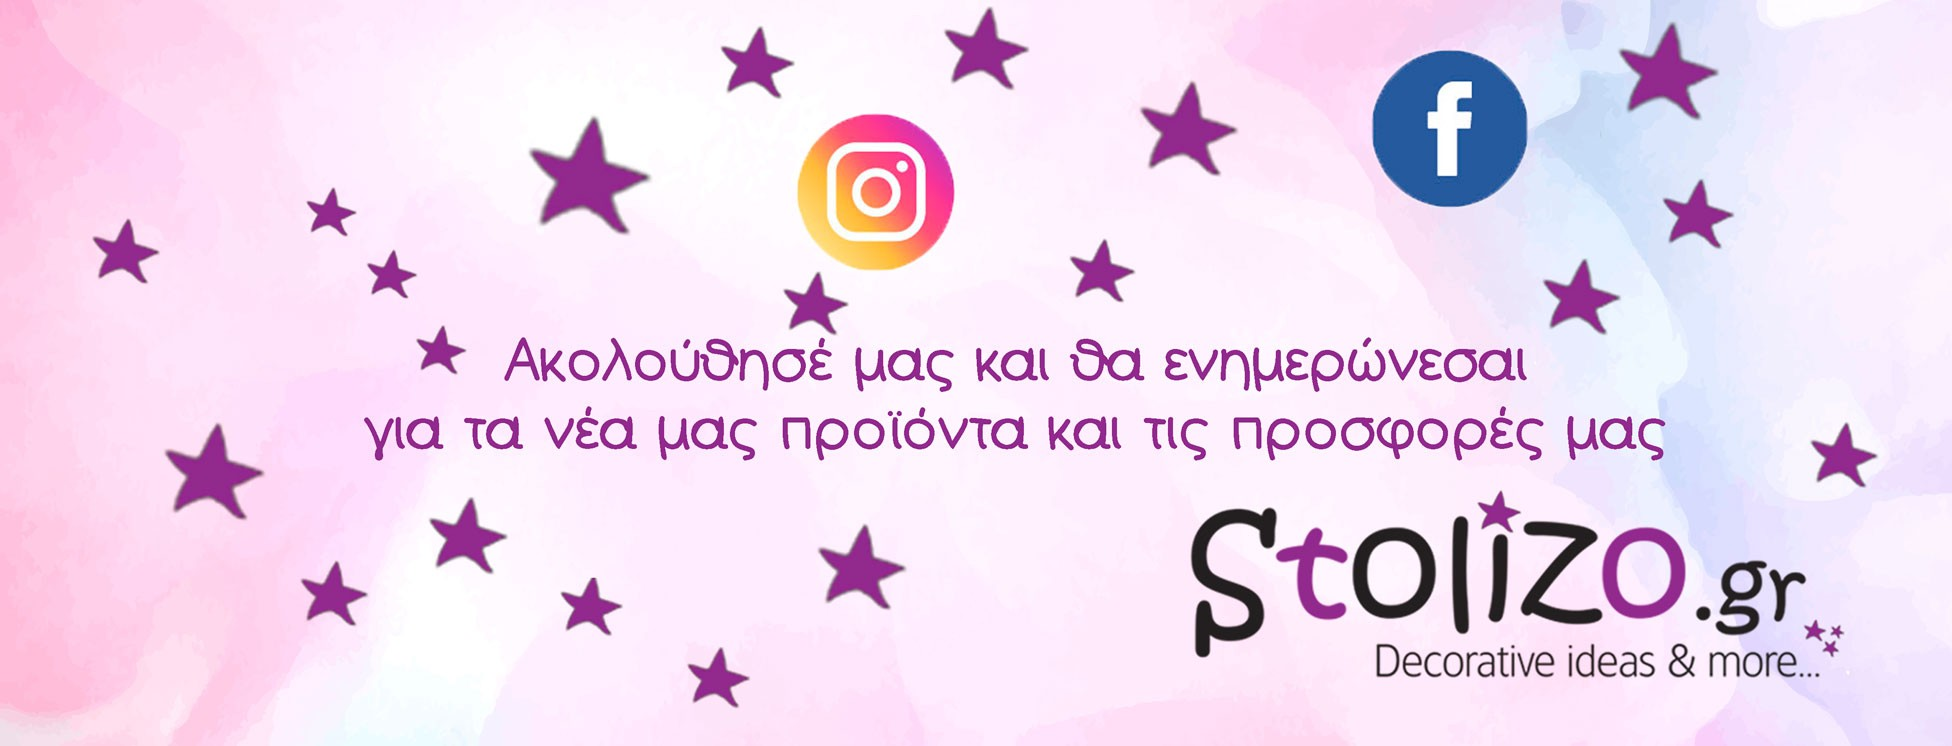 stolizosocialmedia